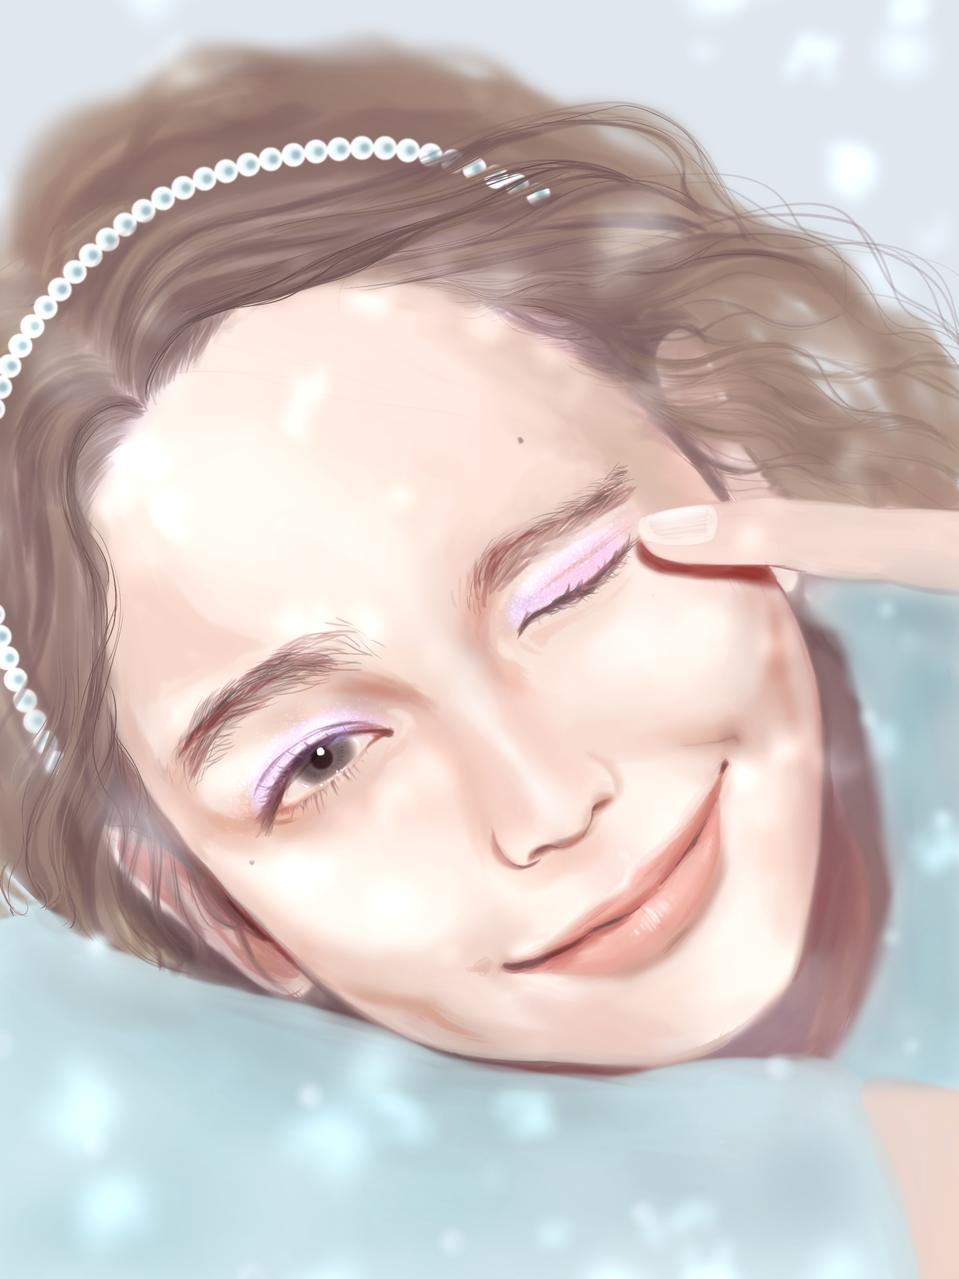 Let it snow Illust of FJ impasto girl レイラニ kawaii fanart snow realistic ThePromisedNeverland